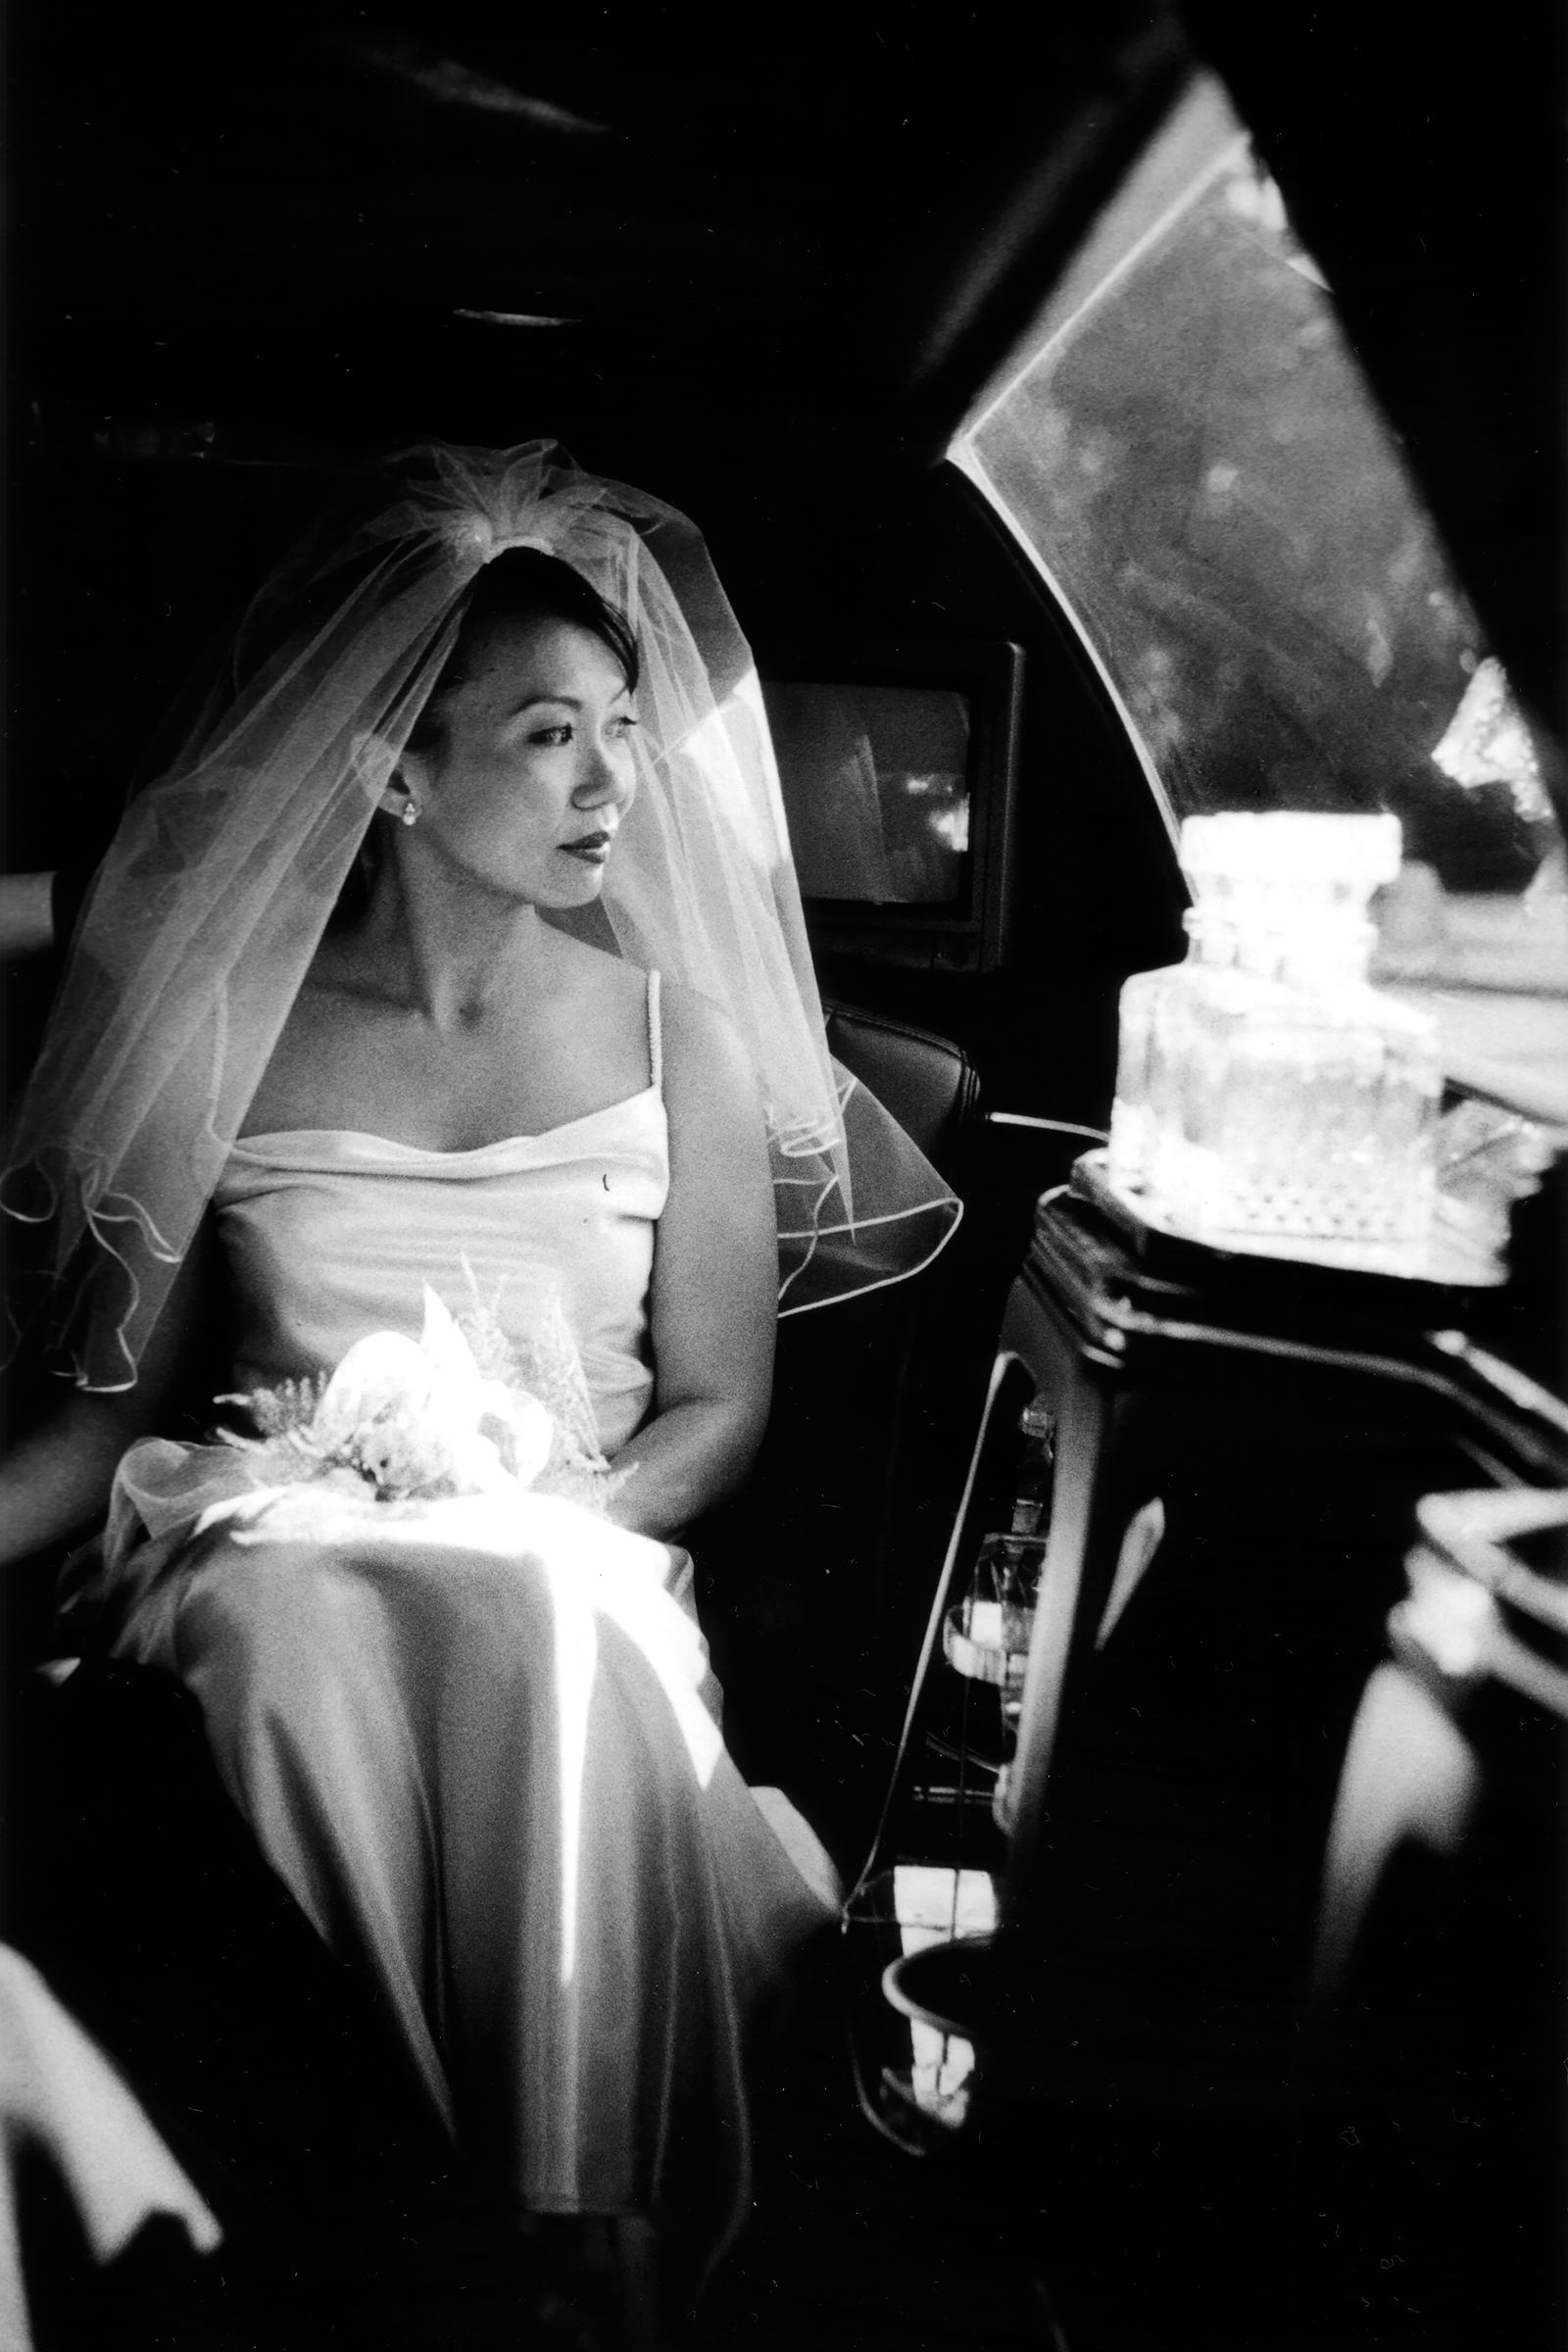 bride-gazing-out-limo-window-bradley-hanson-photography